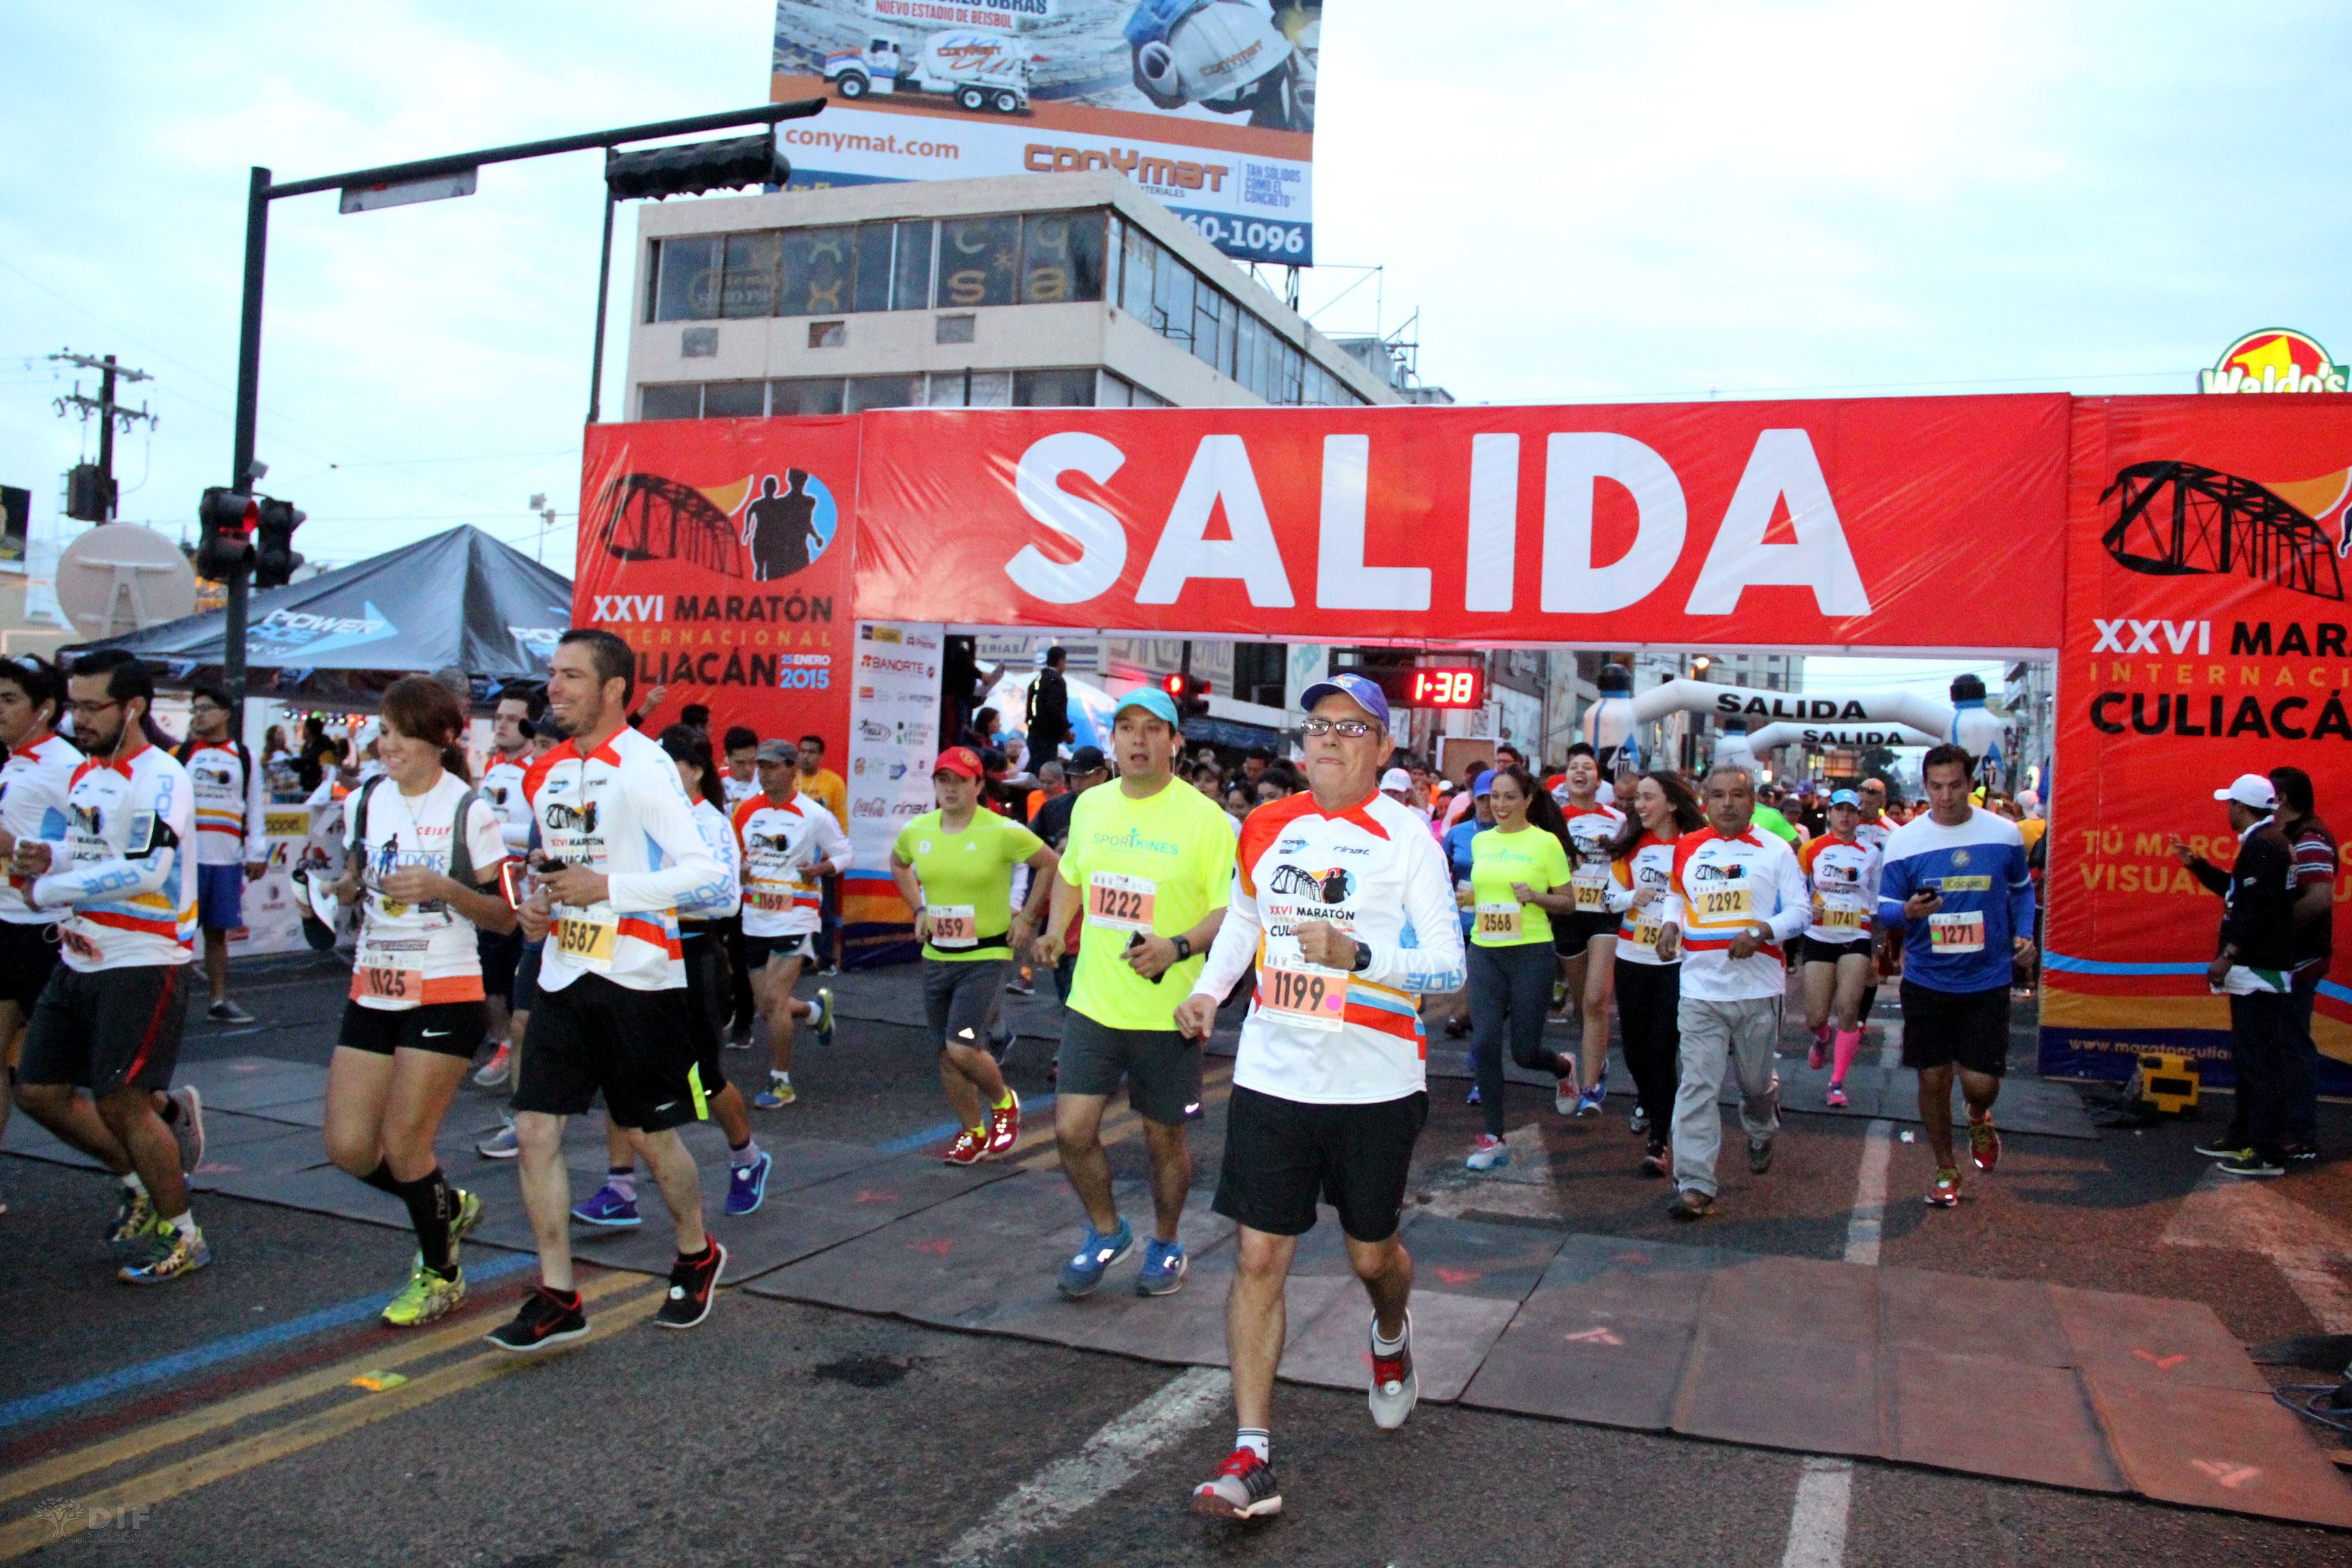 maraton internacional de culiacan